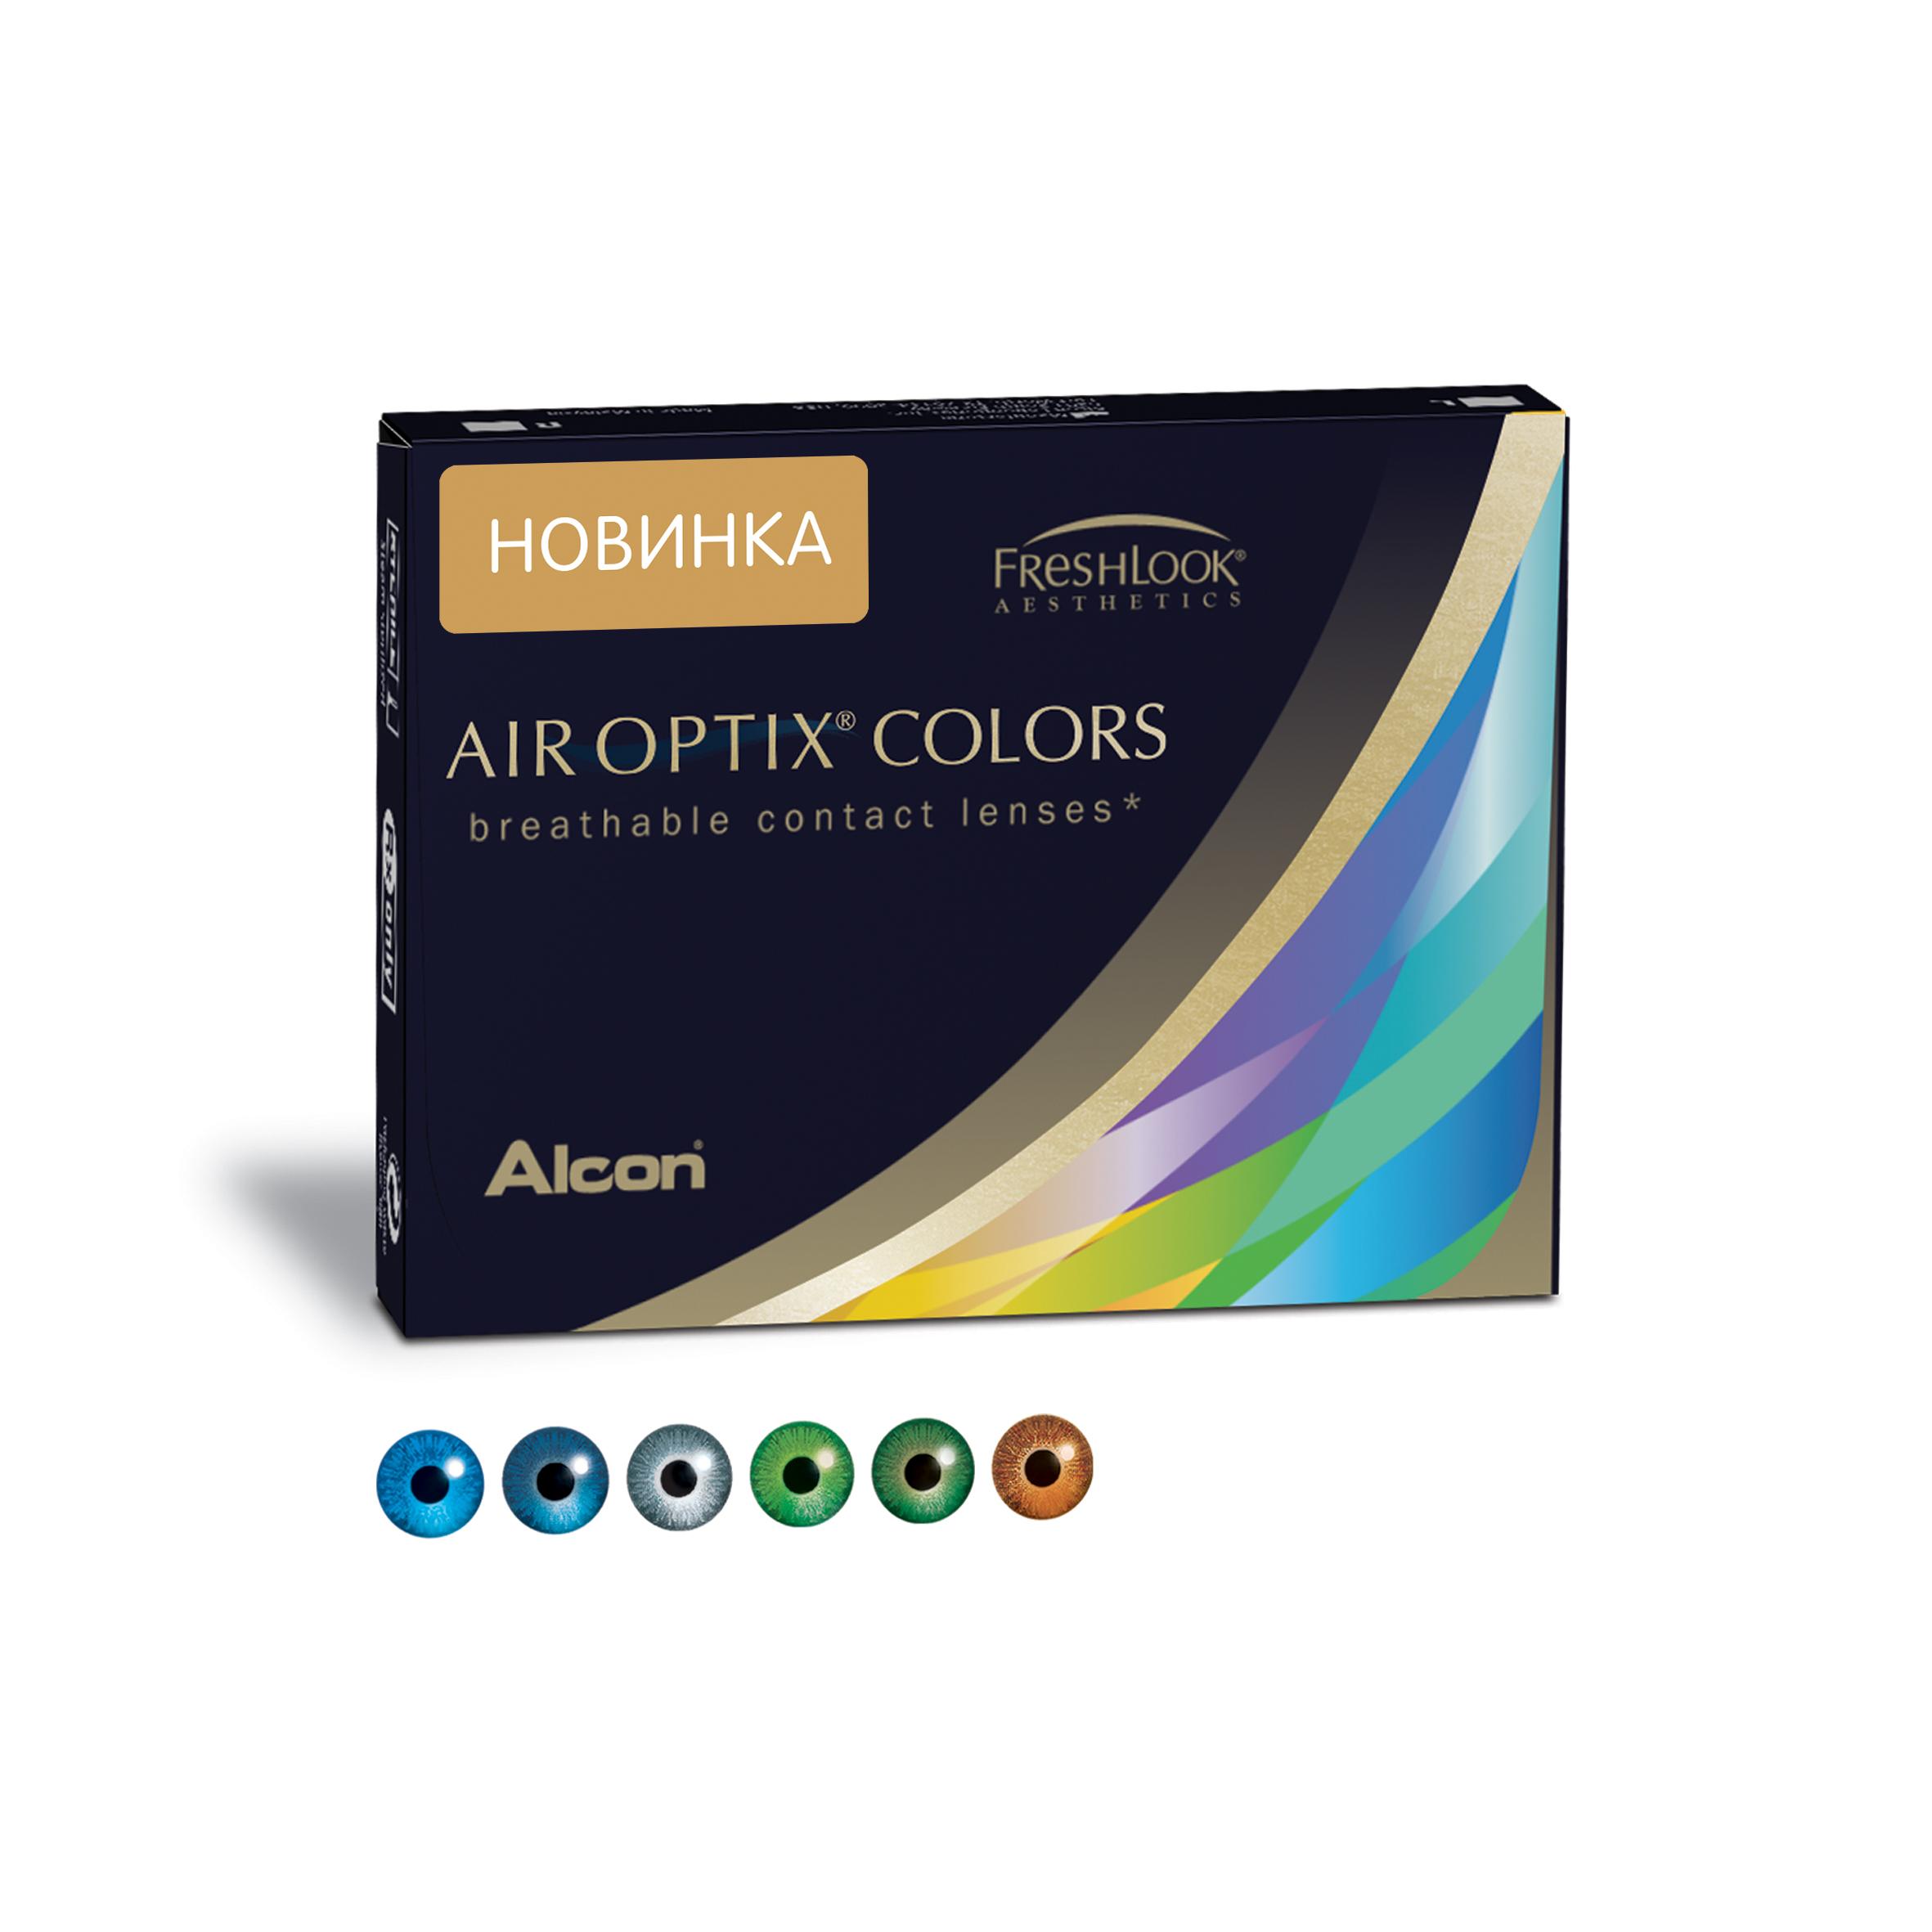 Аlcon контактные линзы Air Optix Colors 2 шт -4.25 Blue31746238Мягкие контактные линзы